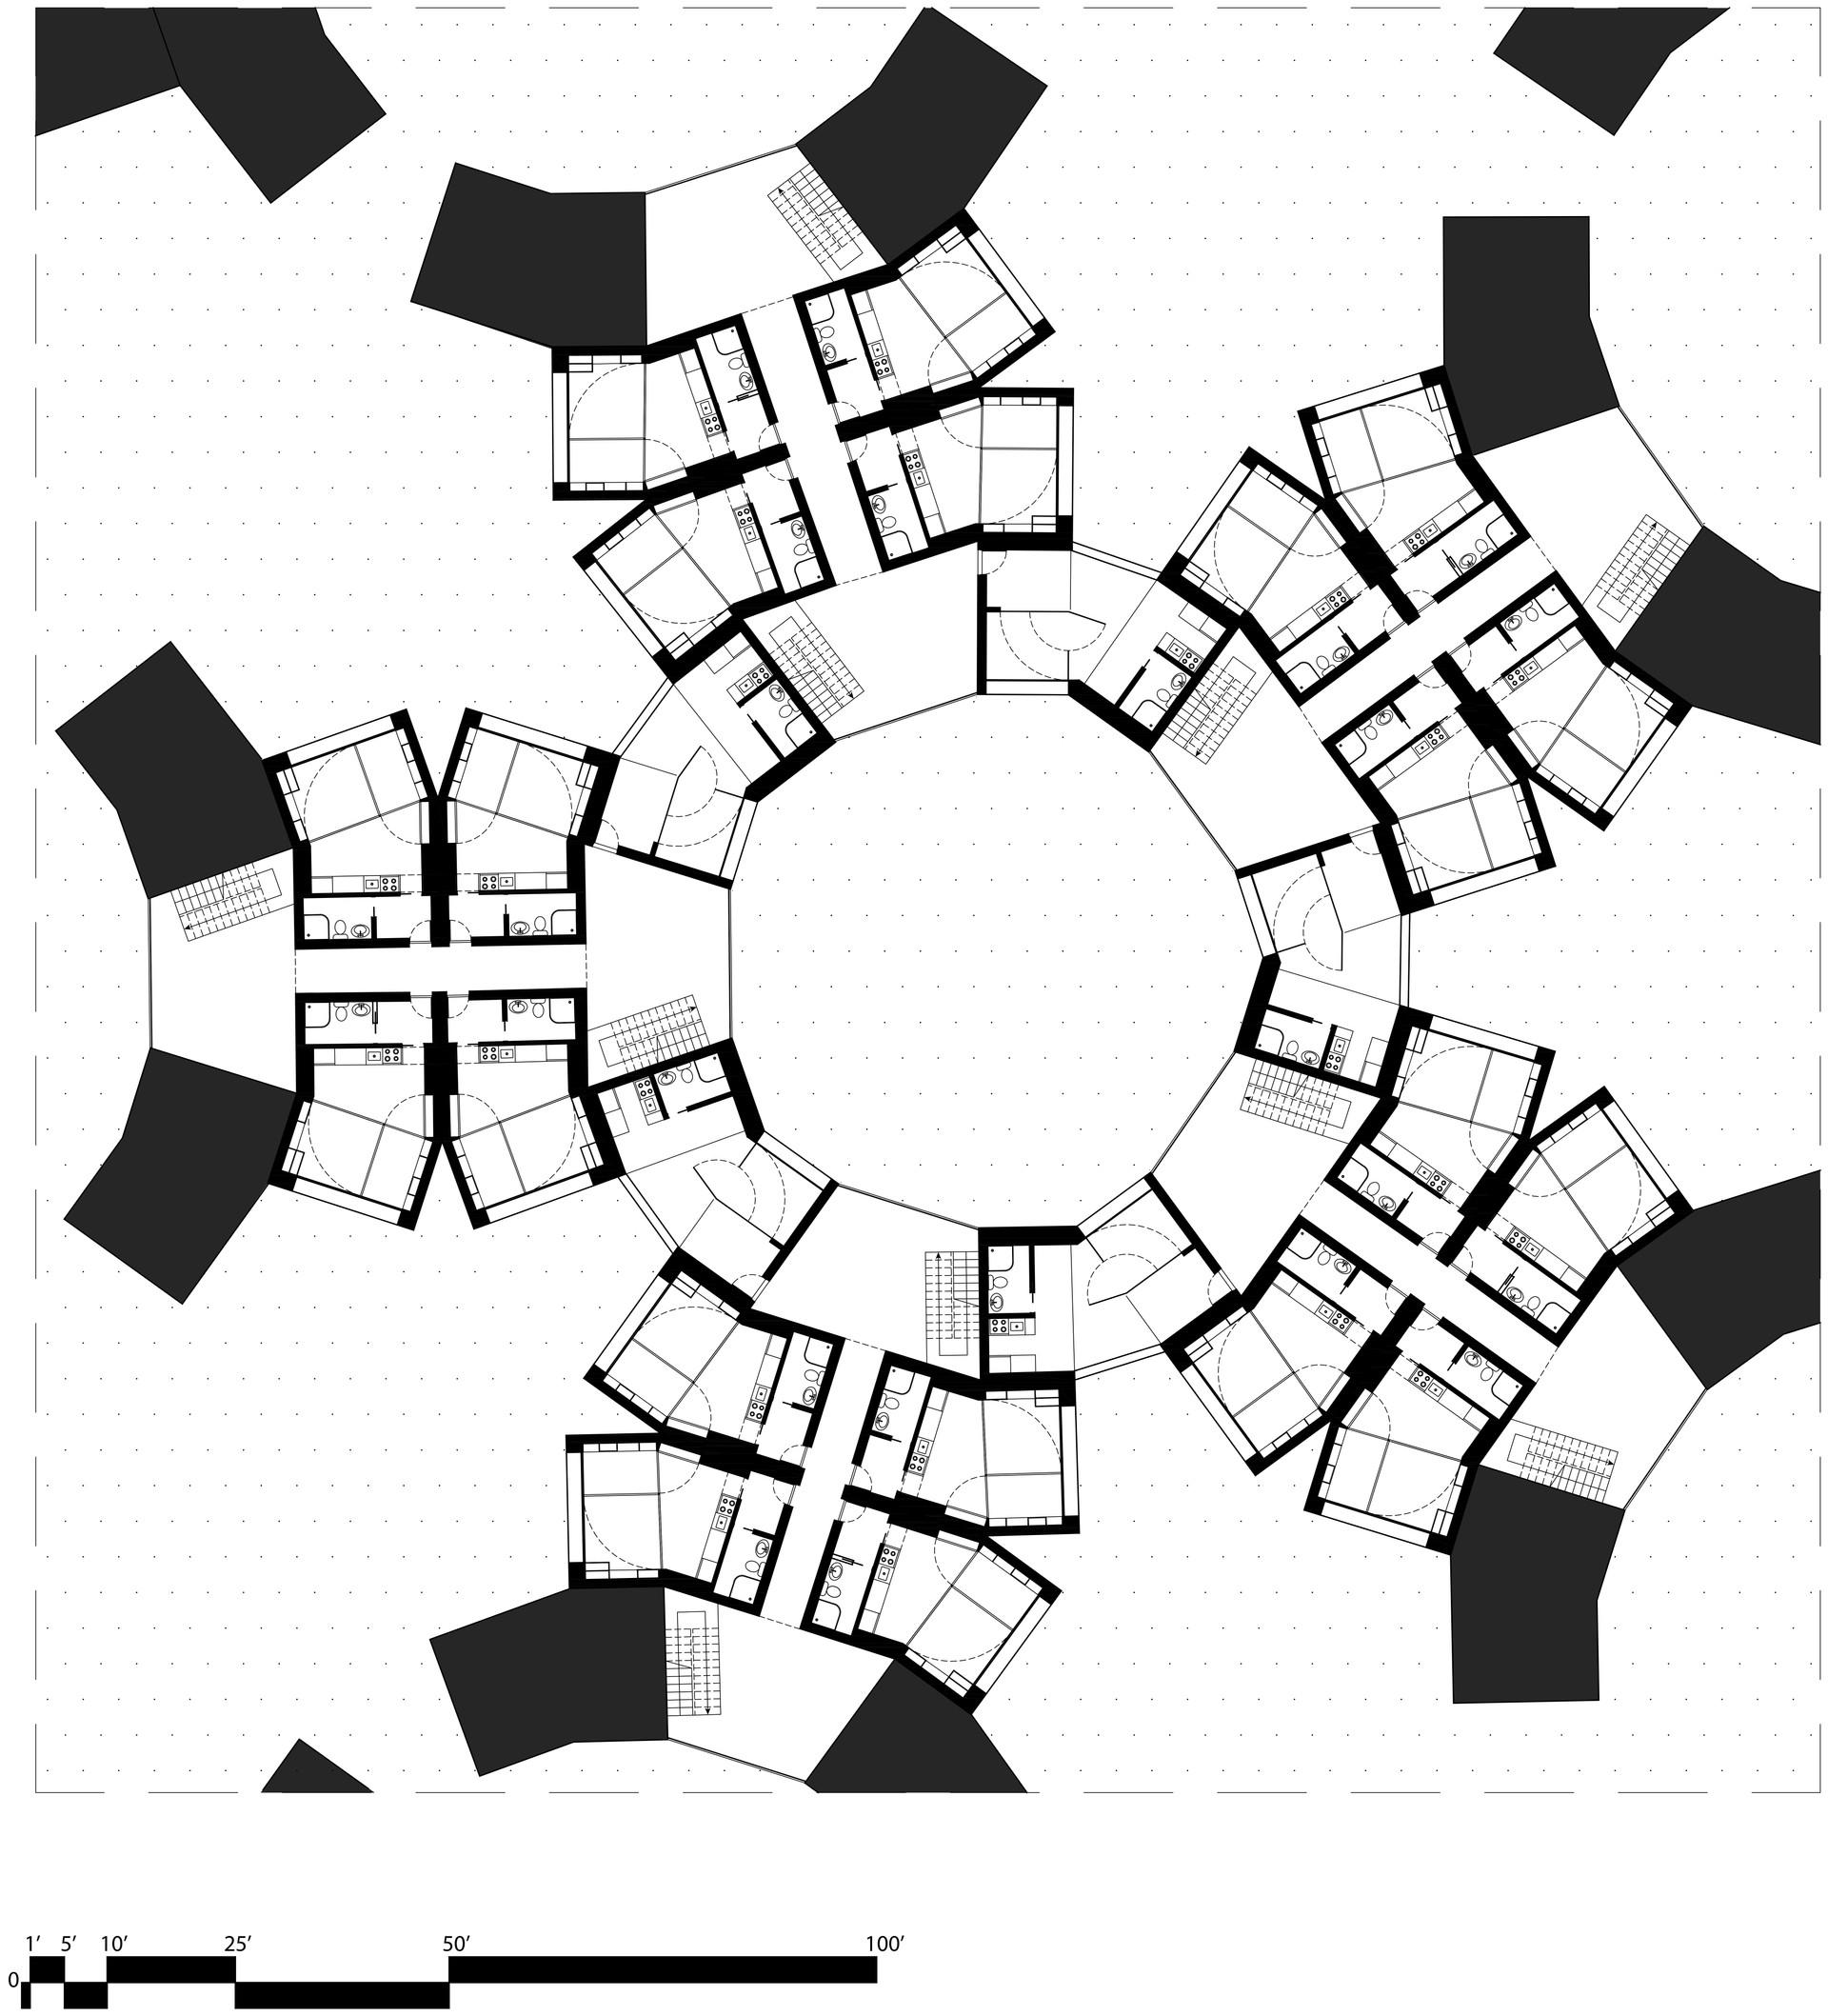 FloorPlan2-3_AntonioLeung.jpg